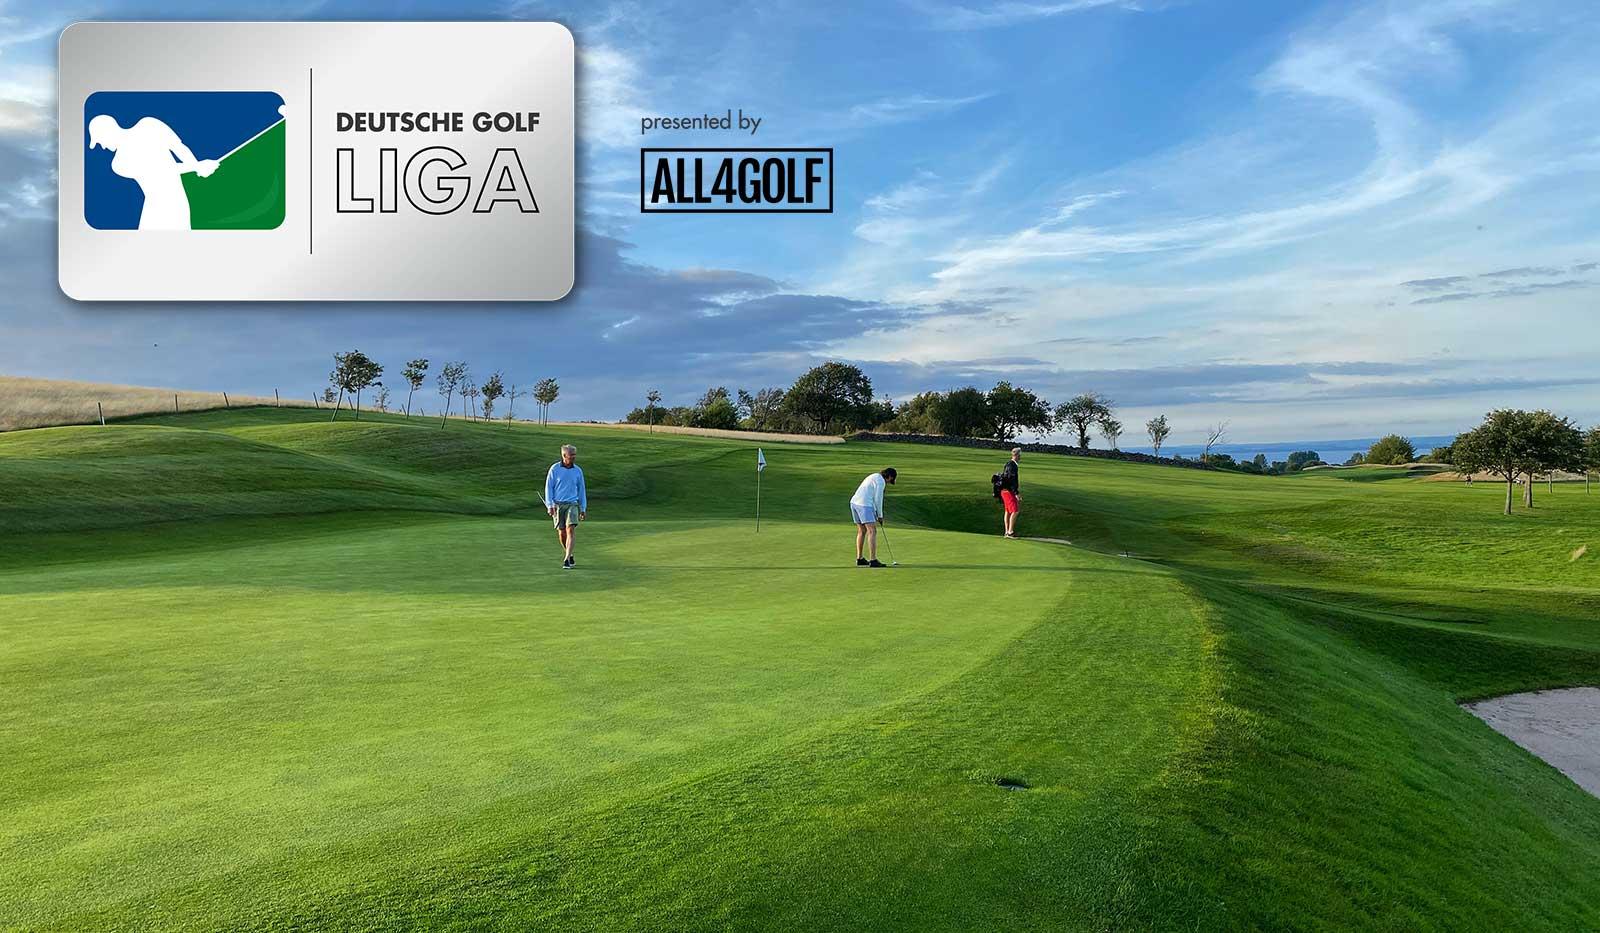 Golfplatz, DGL und All4Golf Logo